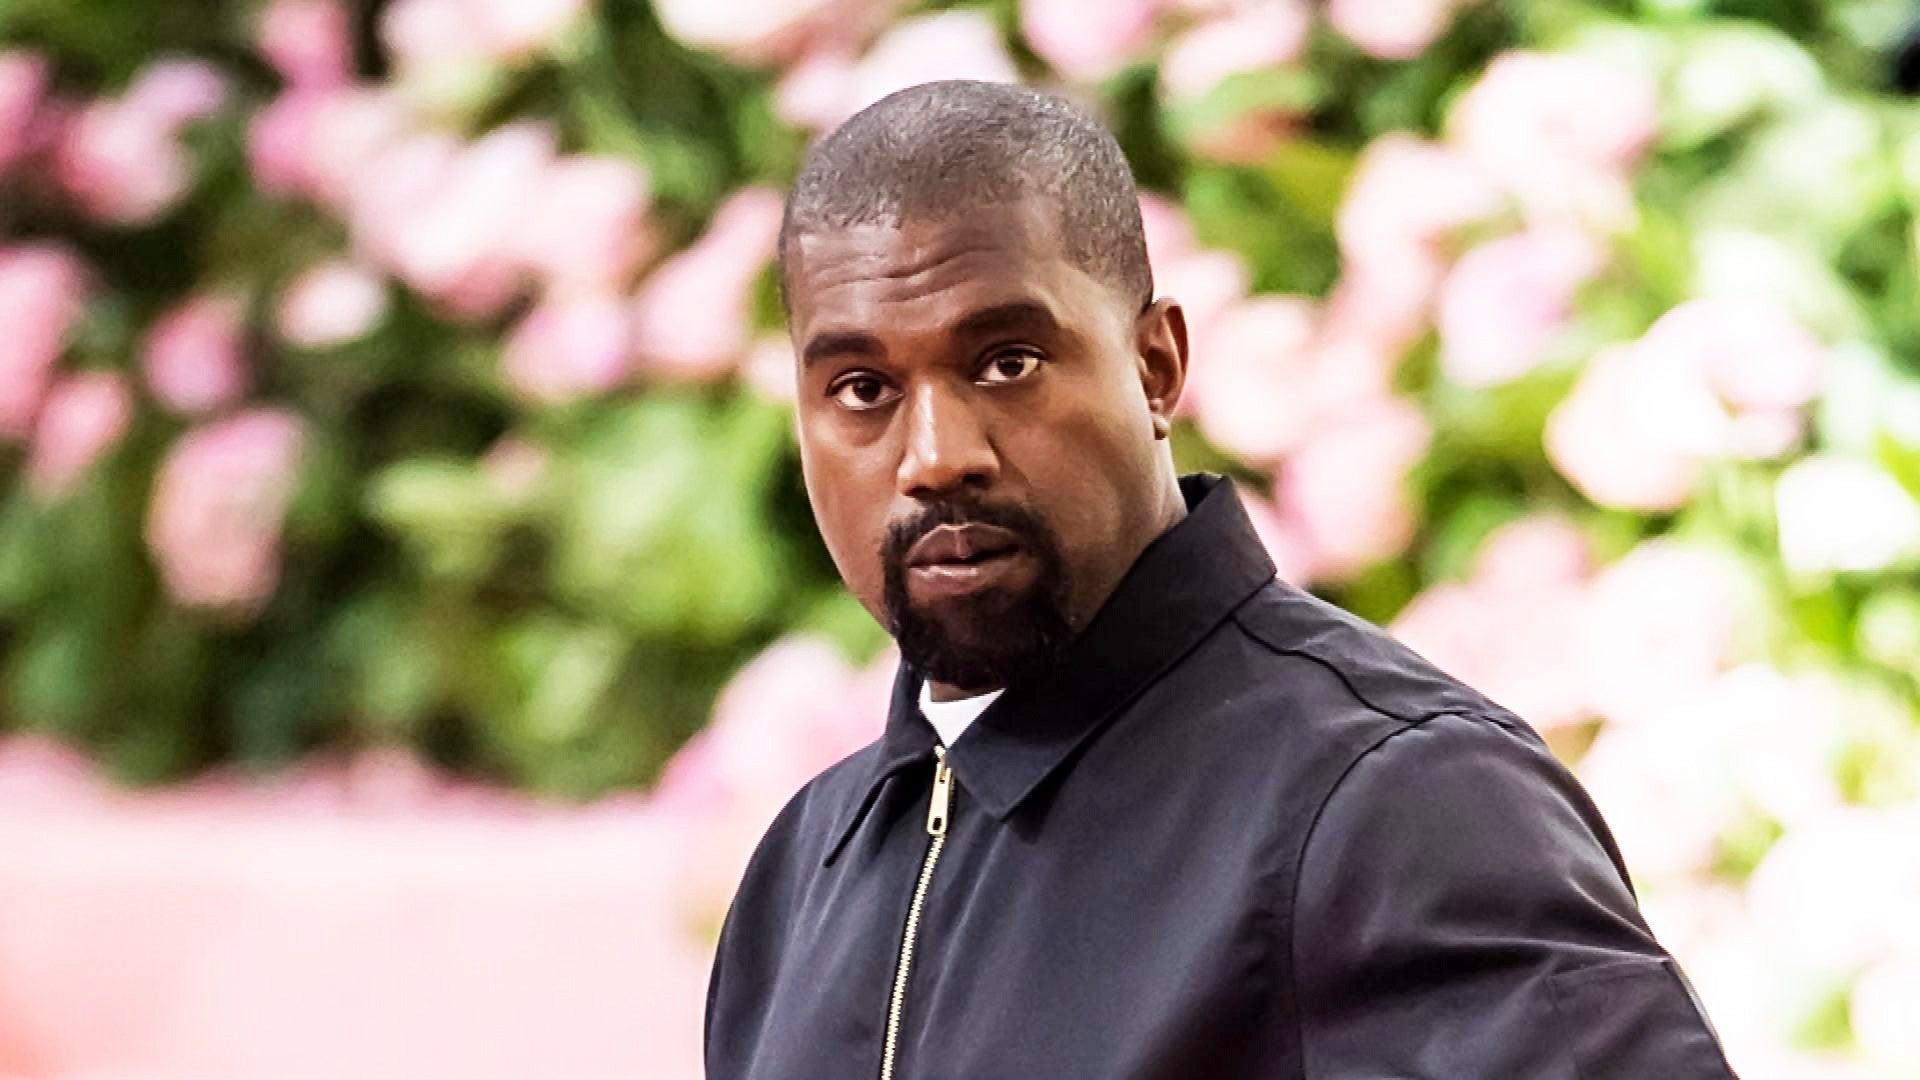 Kim Kardashian Has No Plans To Divorce Kanye West Right Now Source Says Entertainment Tonight